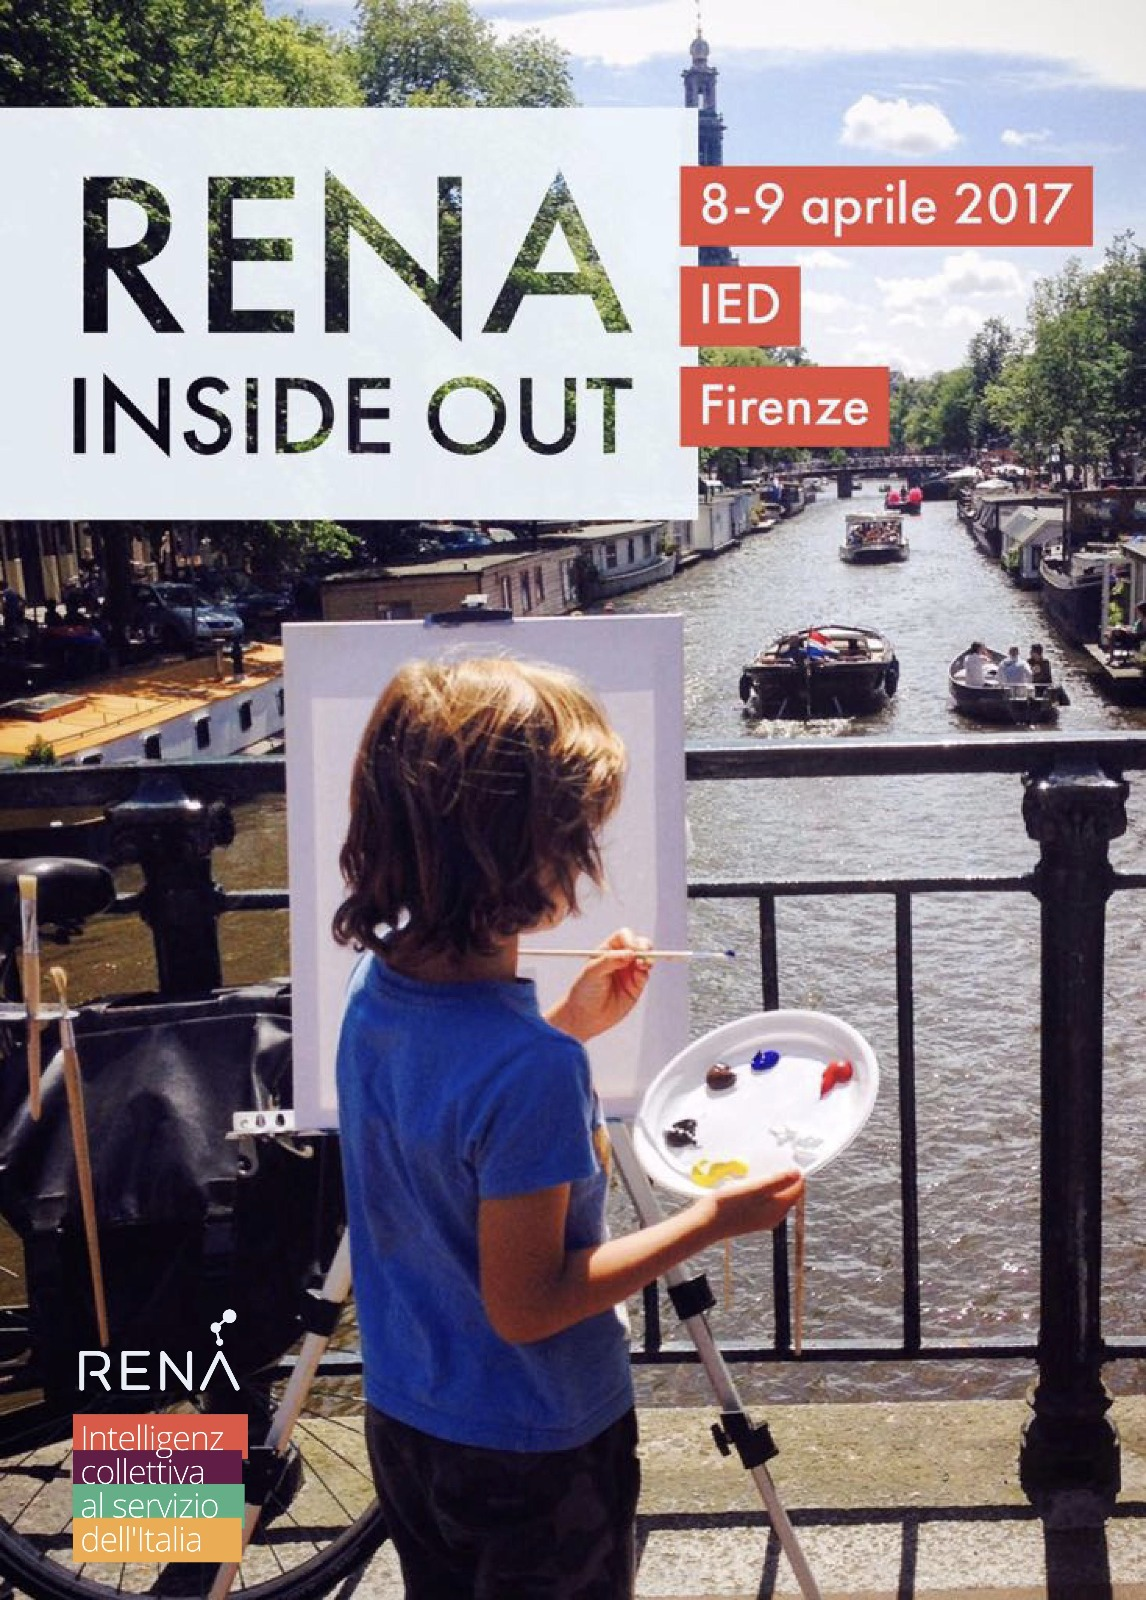 RENA Inside Out I Firenze 8 e 9 aprile 2017